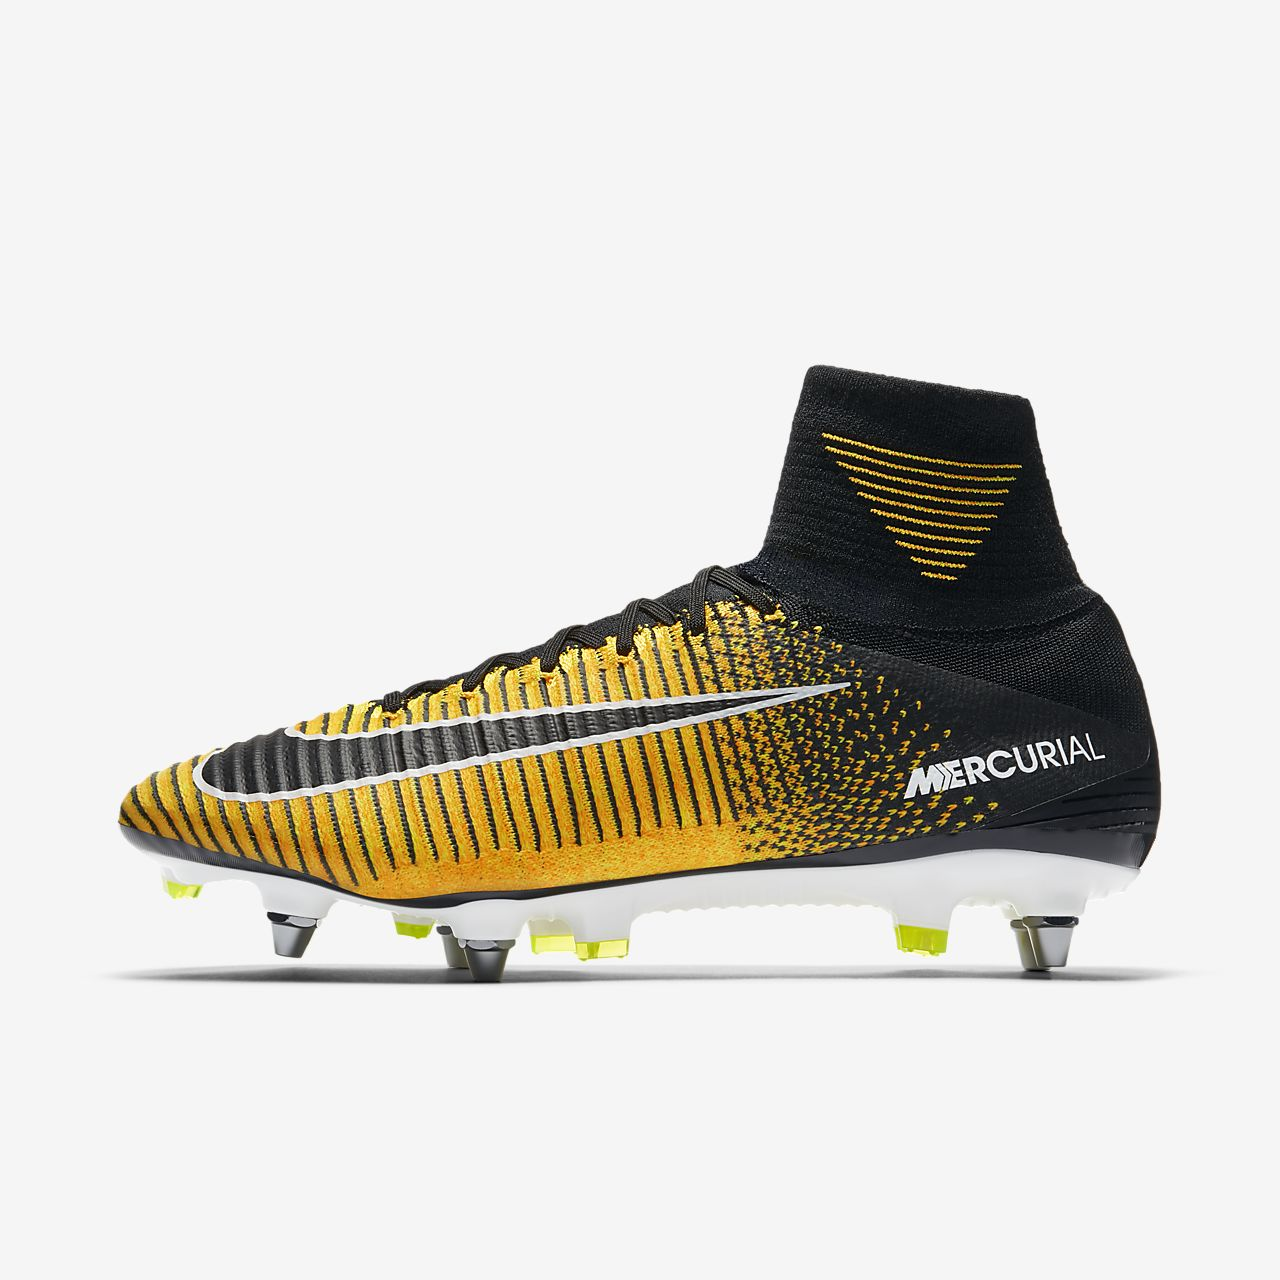 Nike Mercurial Superfly V Dynamic Fit SG-PRO (831956-801) Womens Football Boots Black/White/Orange